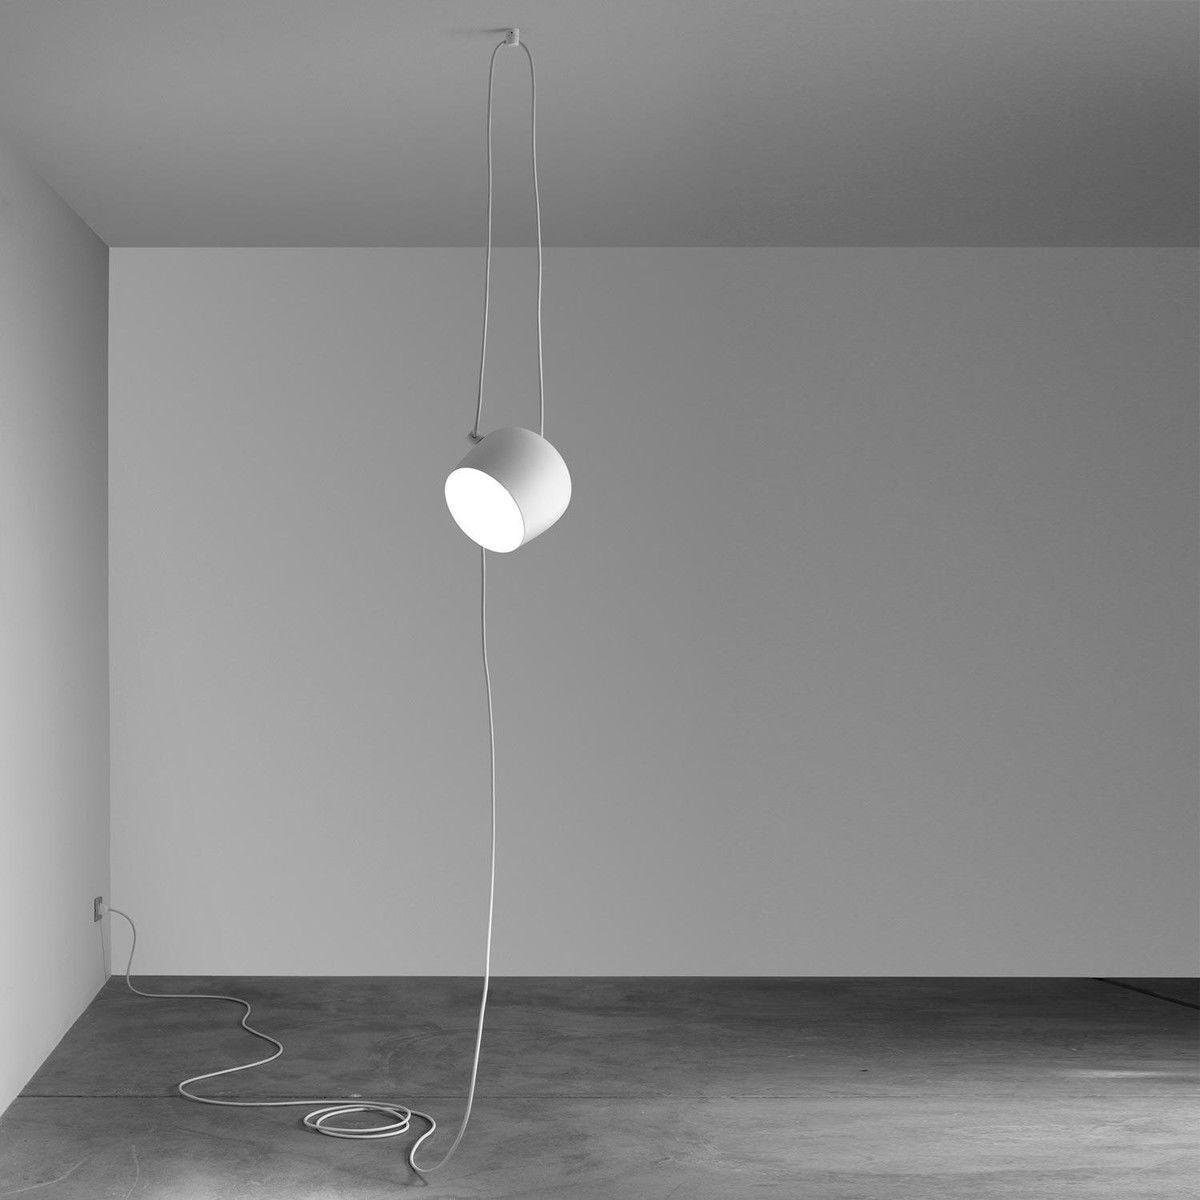 Aim led suspension lamp with plug flos for Aim flos prezzo